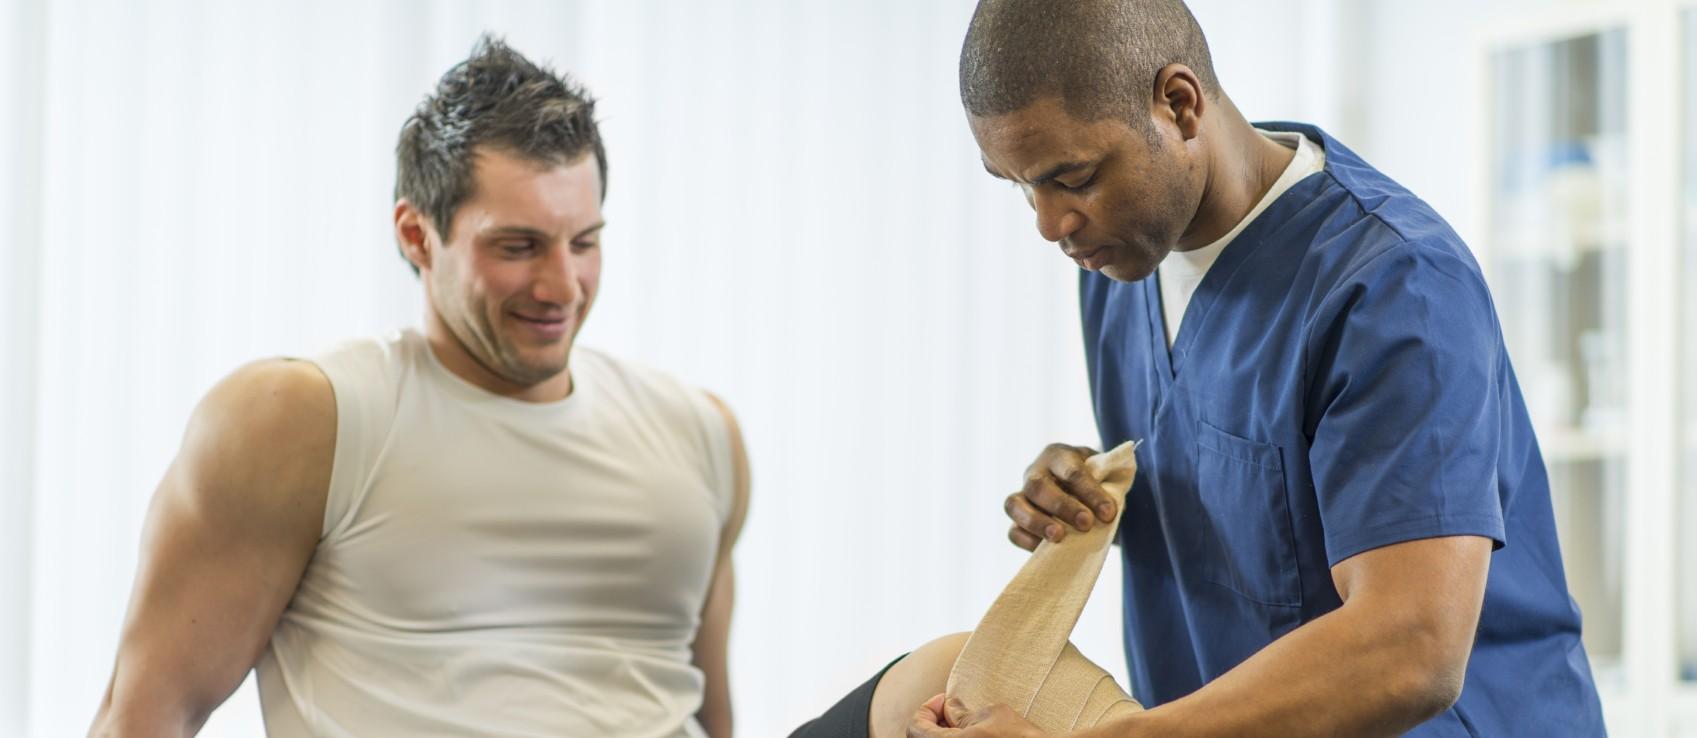 The Top Job In America Is In Healthcare (No, Not Doctor)